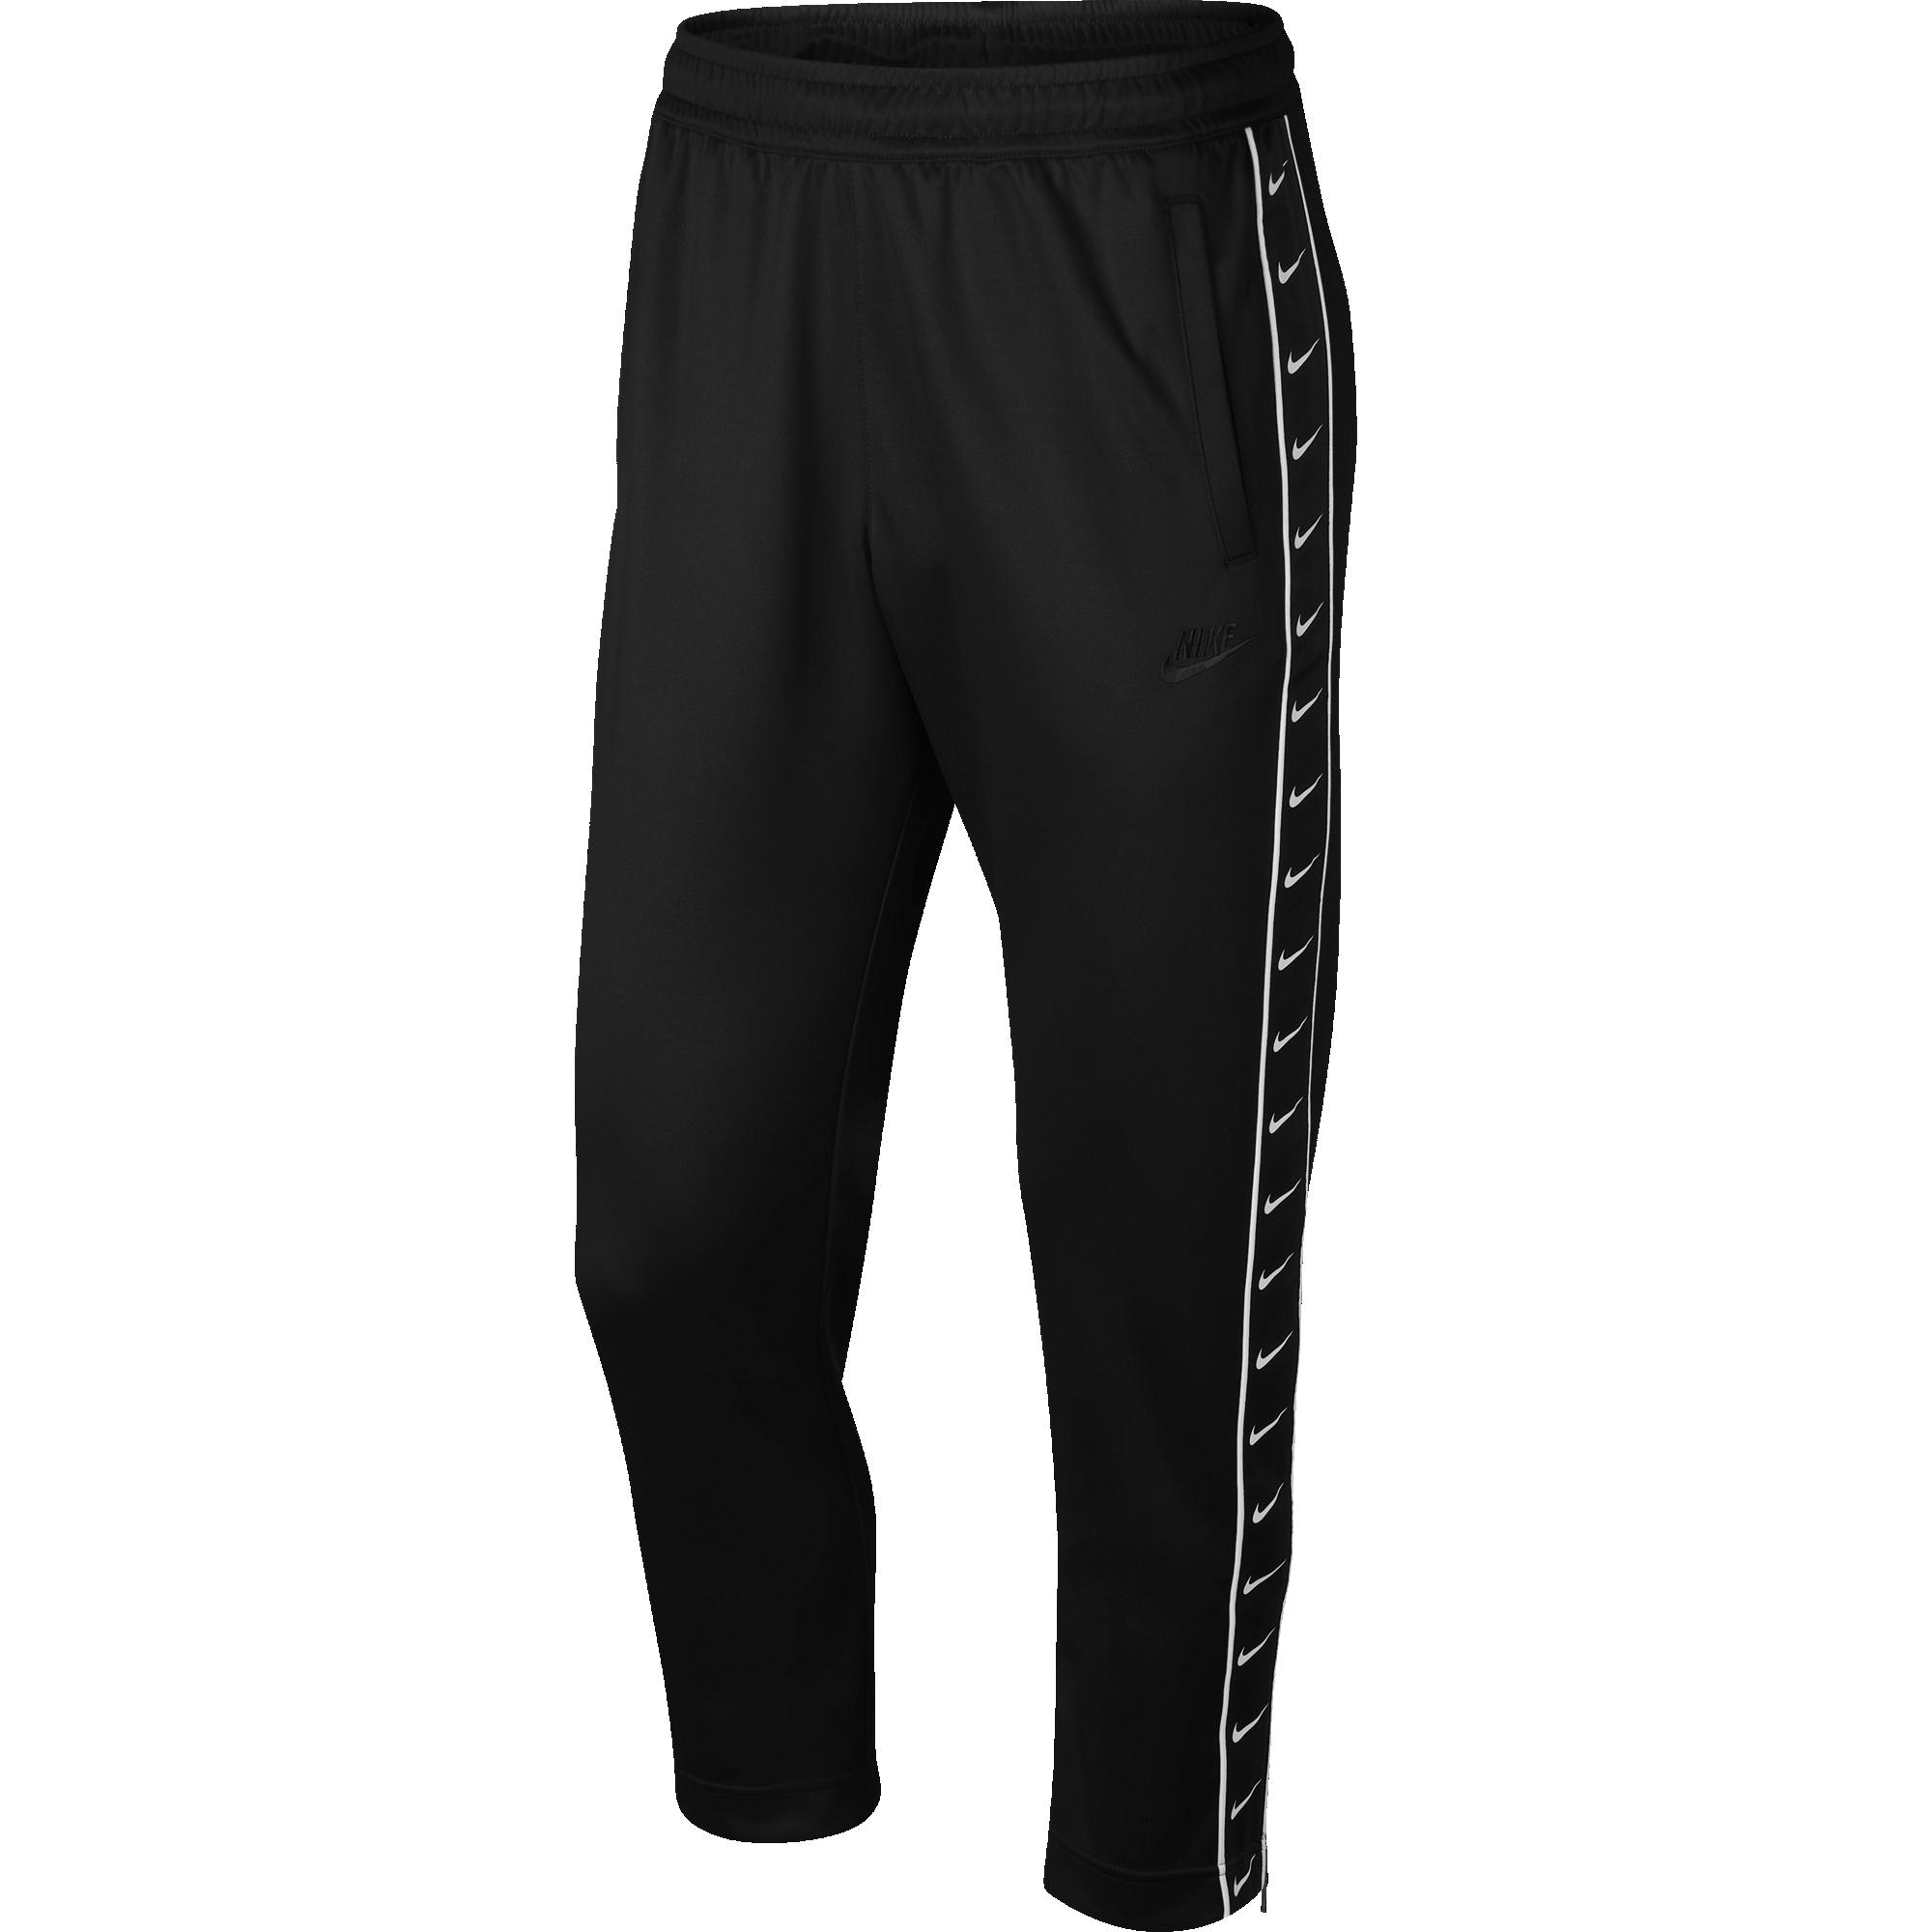 4ad18d9a8 Nike NSW Track Pants - Black/White-Black   AR3142-010 - MODA3